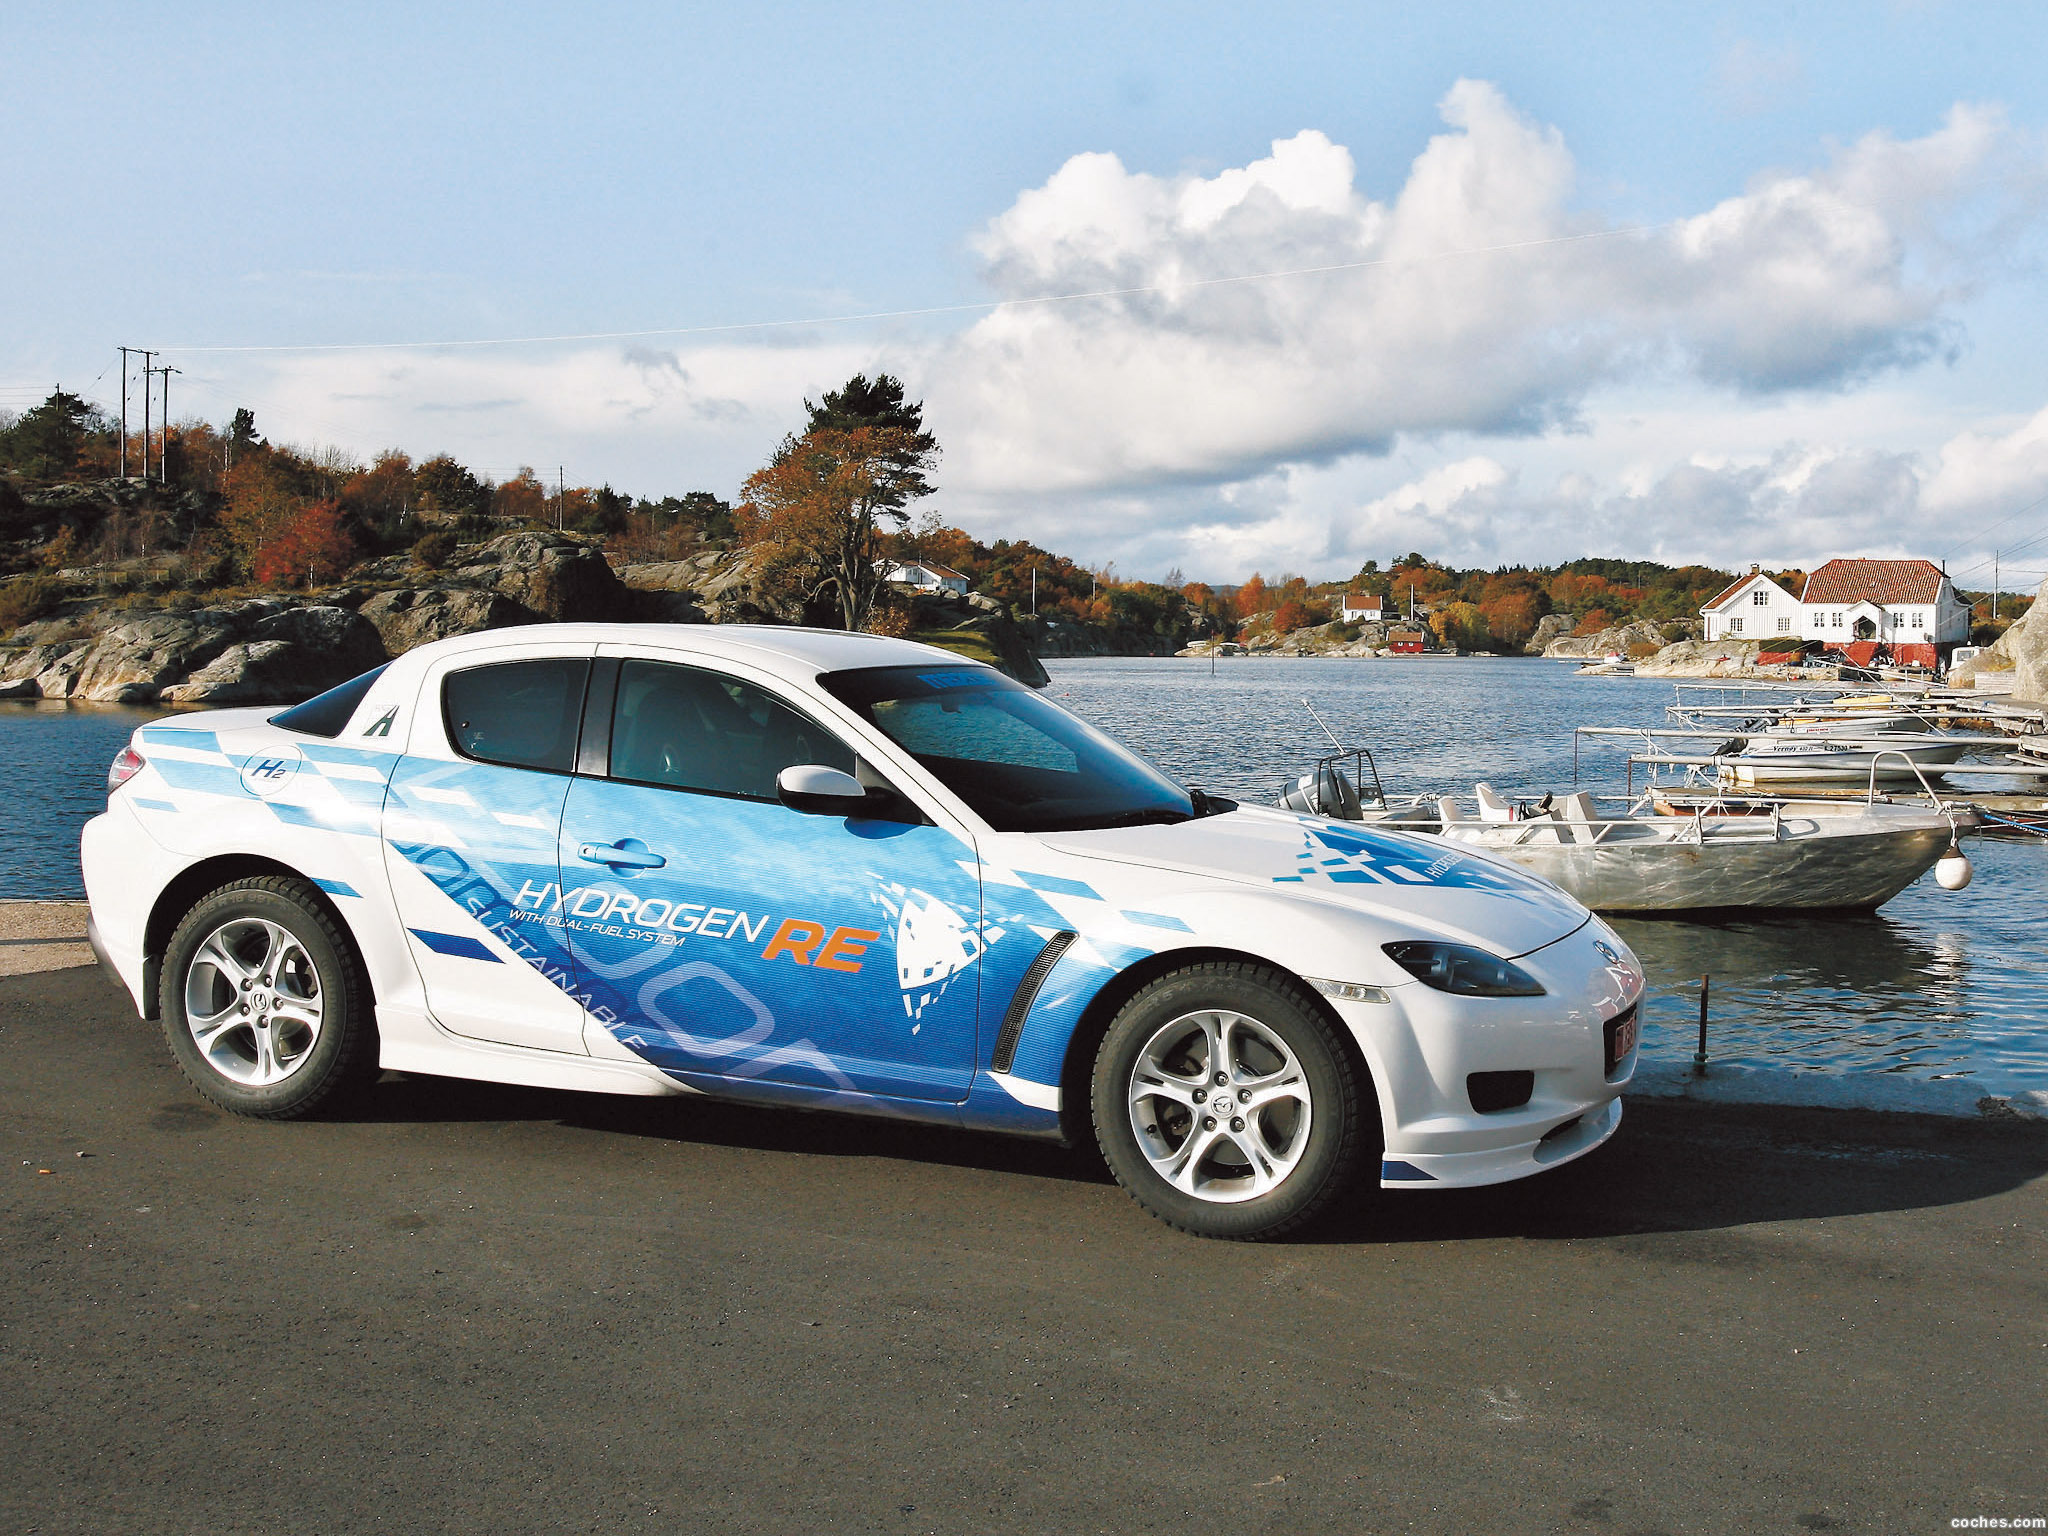 Foto 7 de Mazda RX-8 Hydrogen Re Dual Fuel System 2009